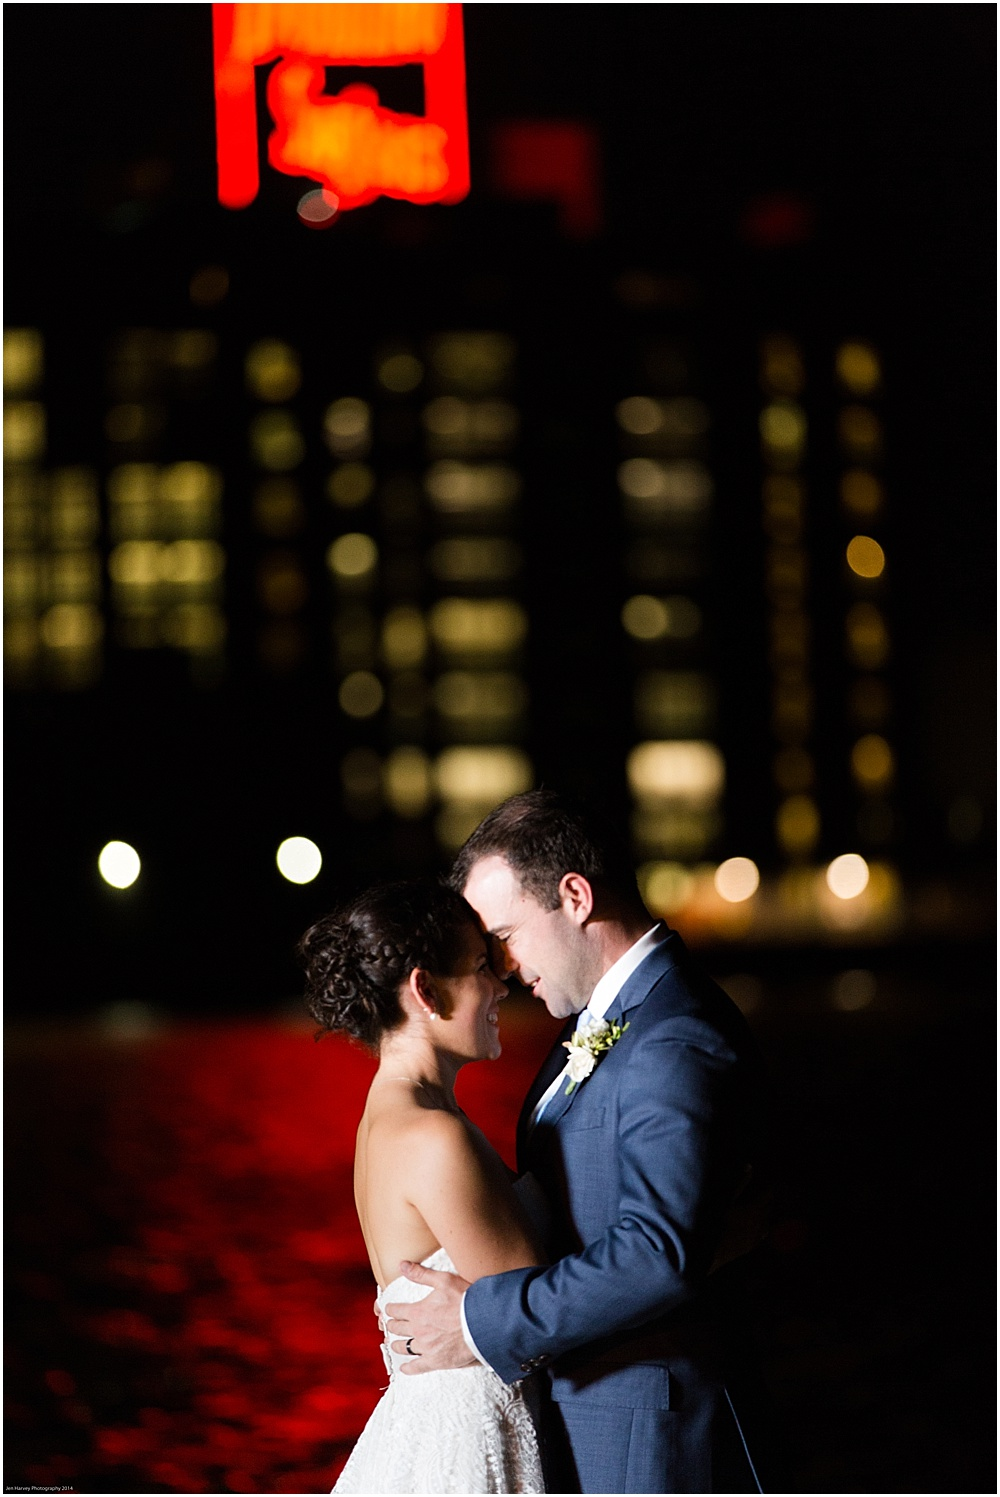 liz_robert_fredick_douglas_martime_museum_baltimore_wedding_photographer_0005